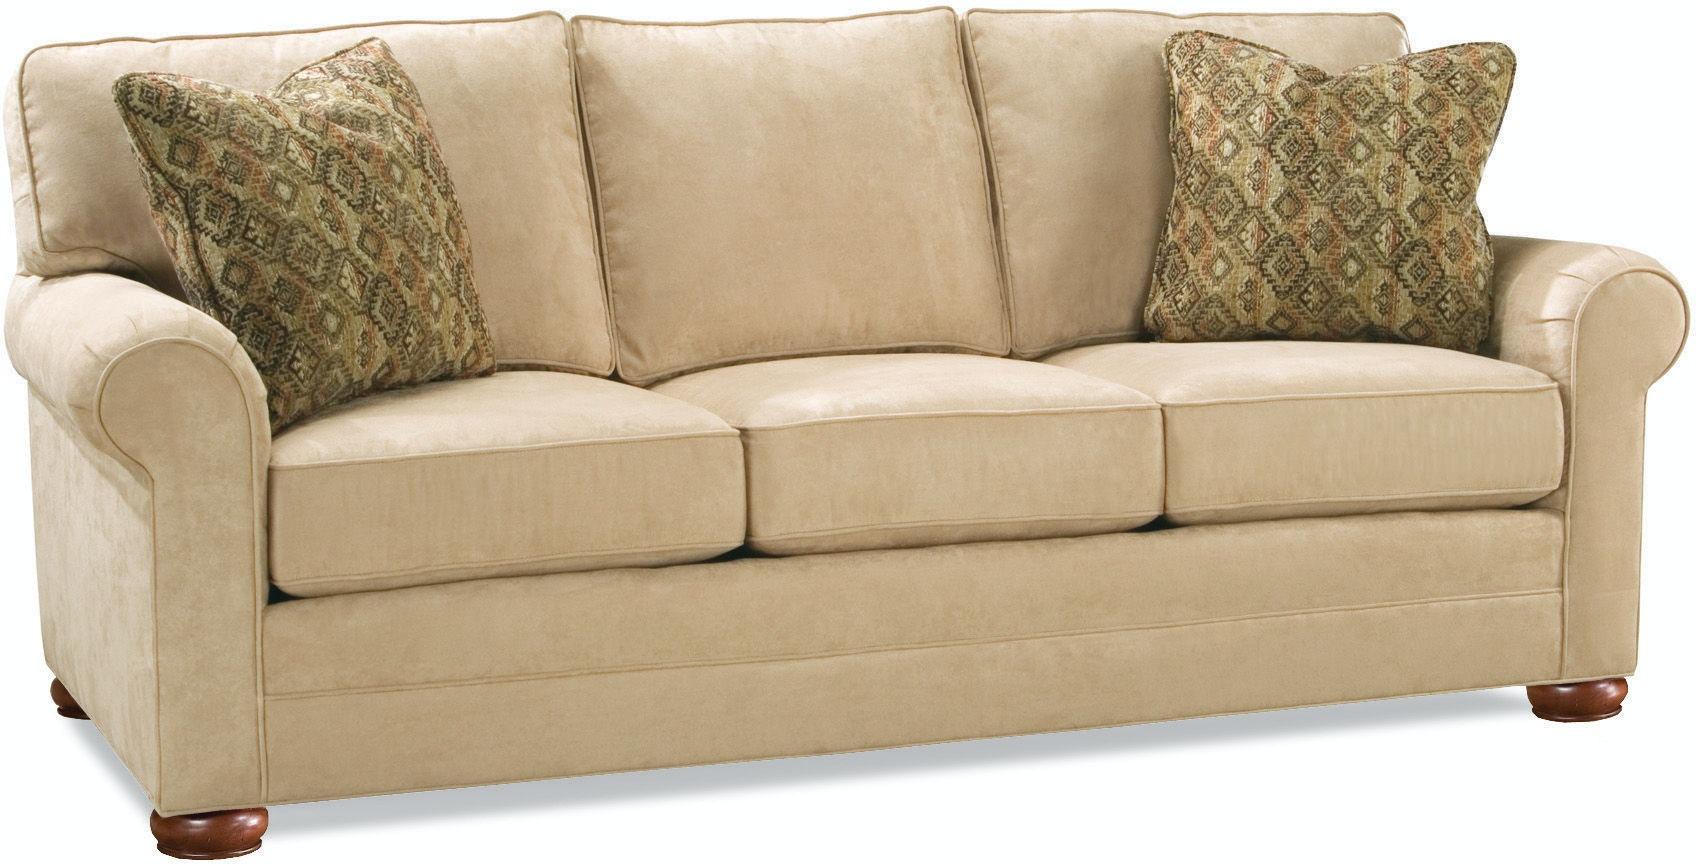 Carol House Sofas Carol House Furniture 17 Reviews S 2332